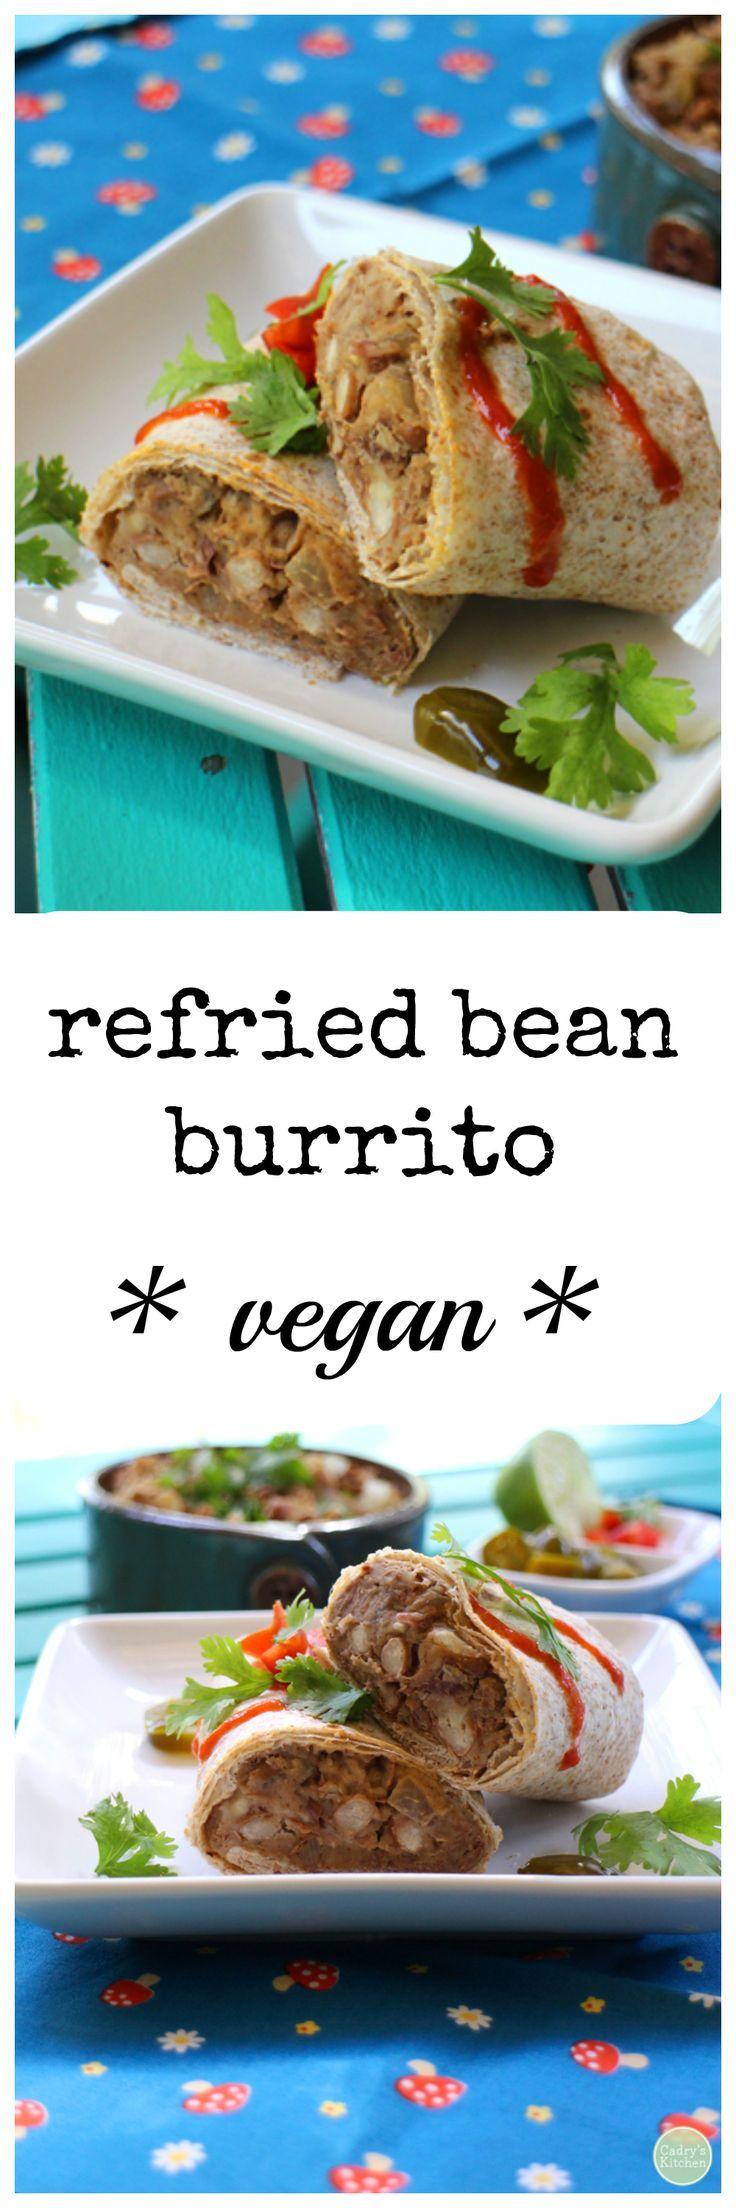 A cozy & comforting lunch - refried bean burrito | cadryskitchen.com #vegan